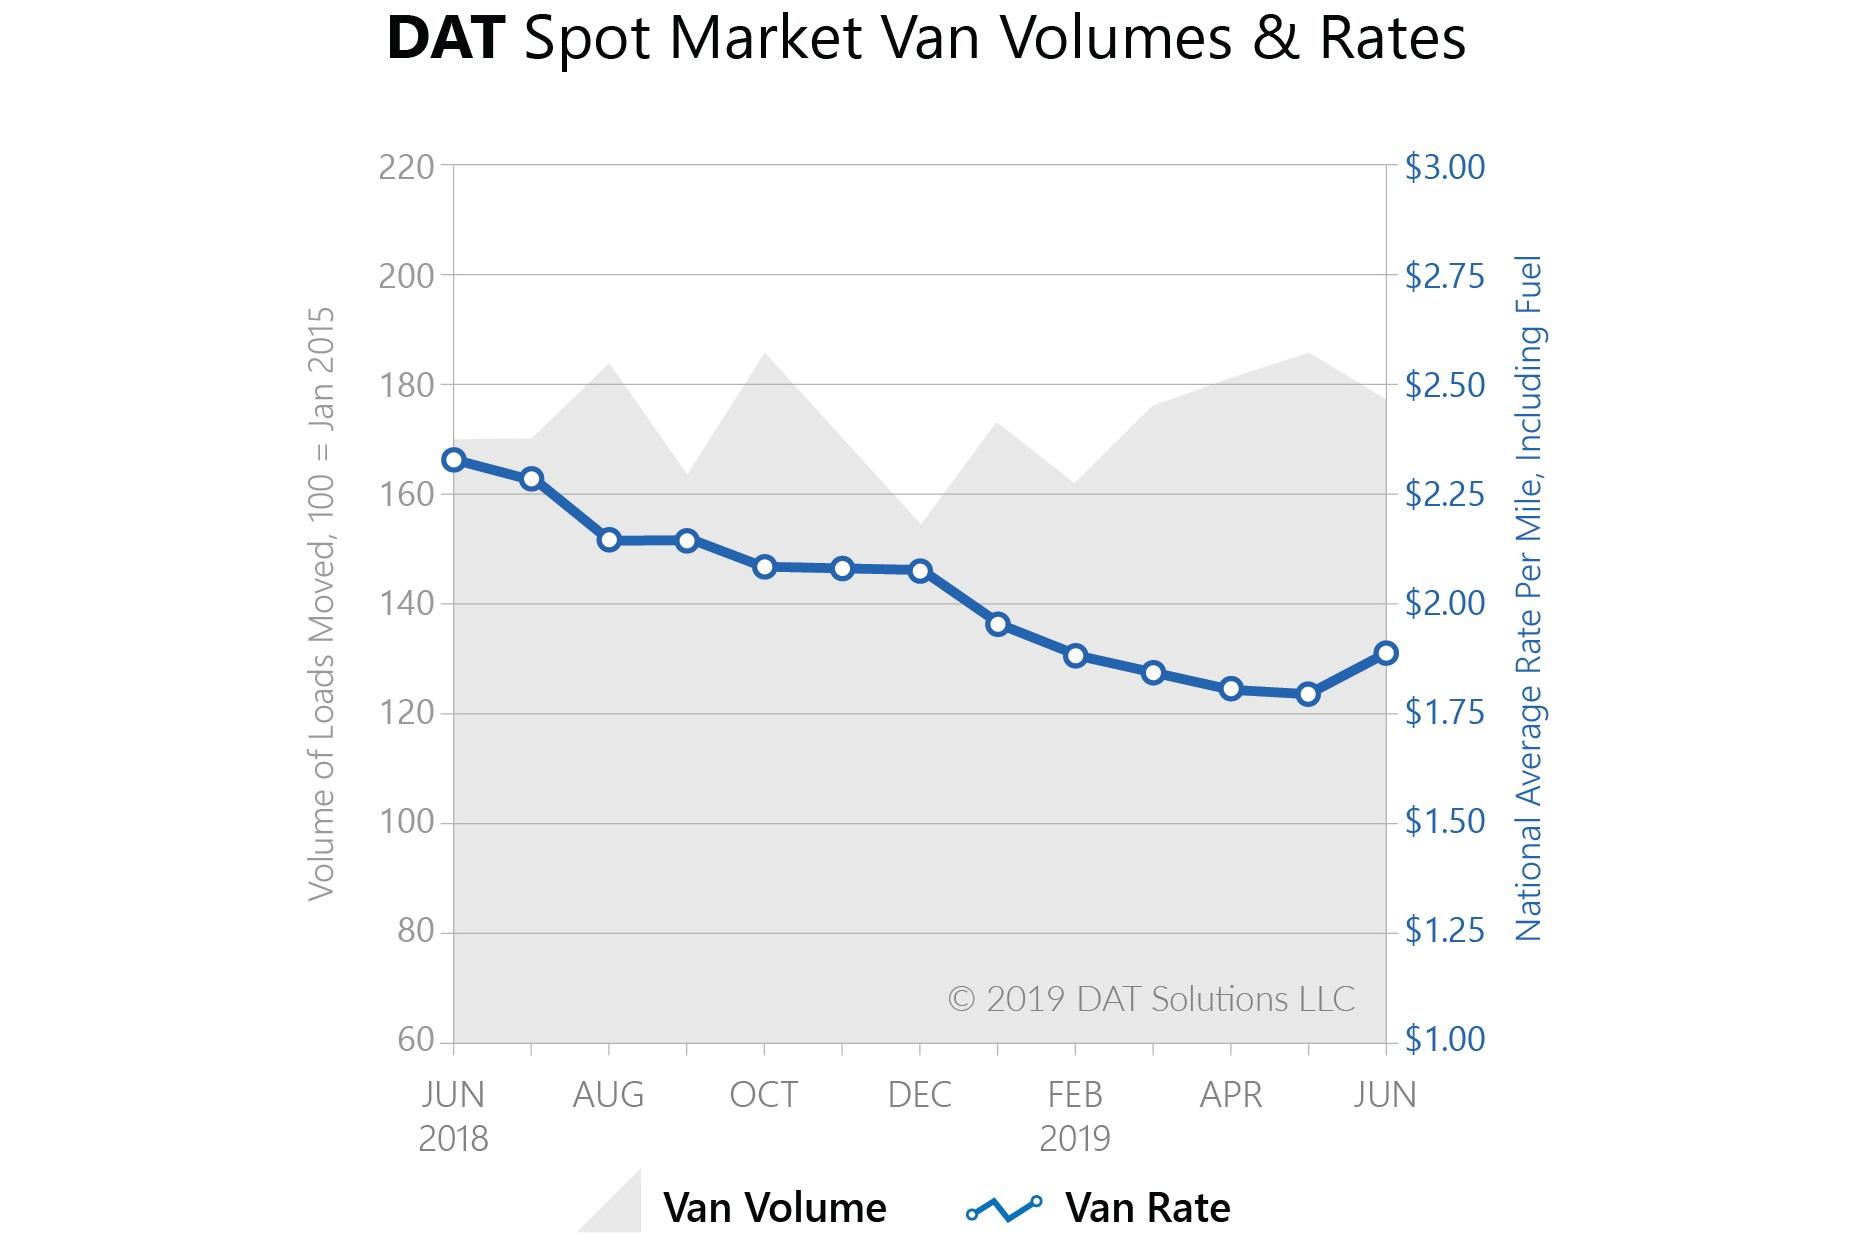 spot market rates hit highest levels since january - fleet management -  trucking info